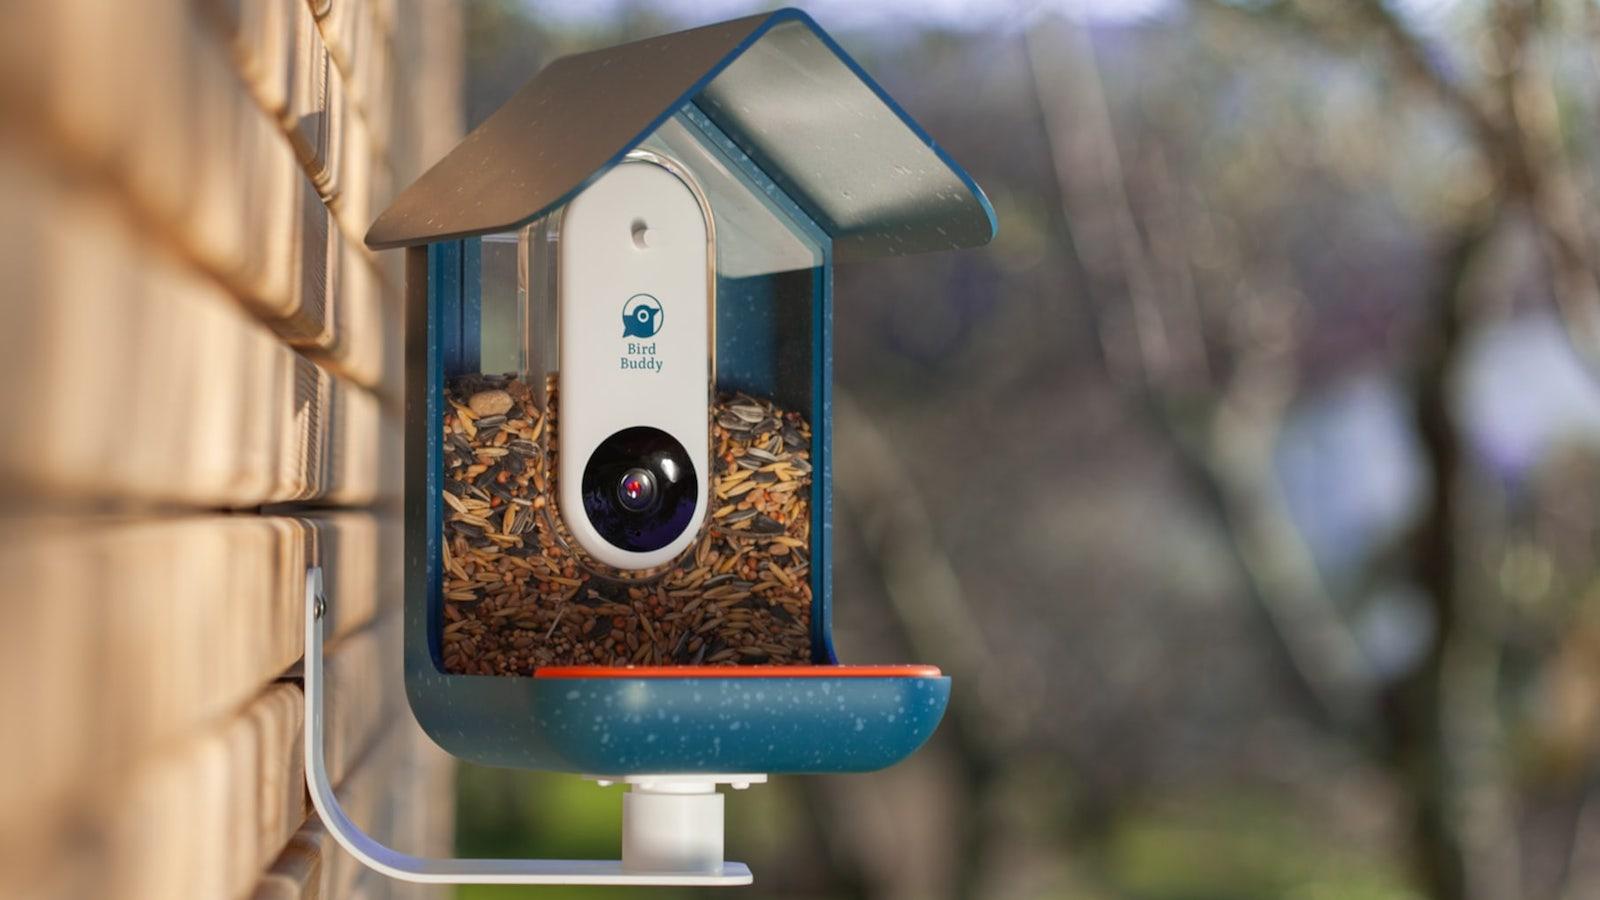 Bird Buddy smart bird feeder captures photos of feathered visitors